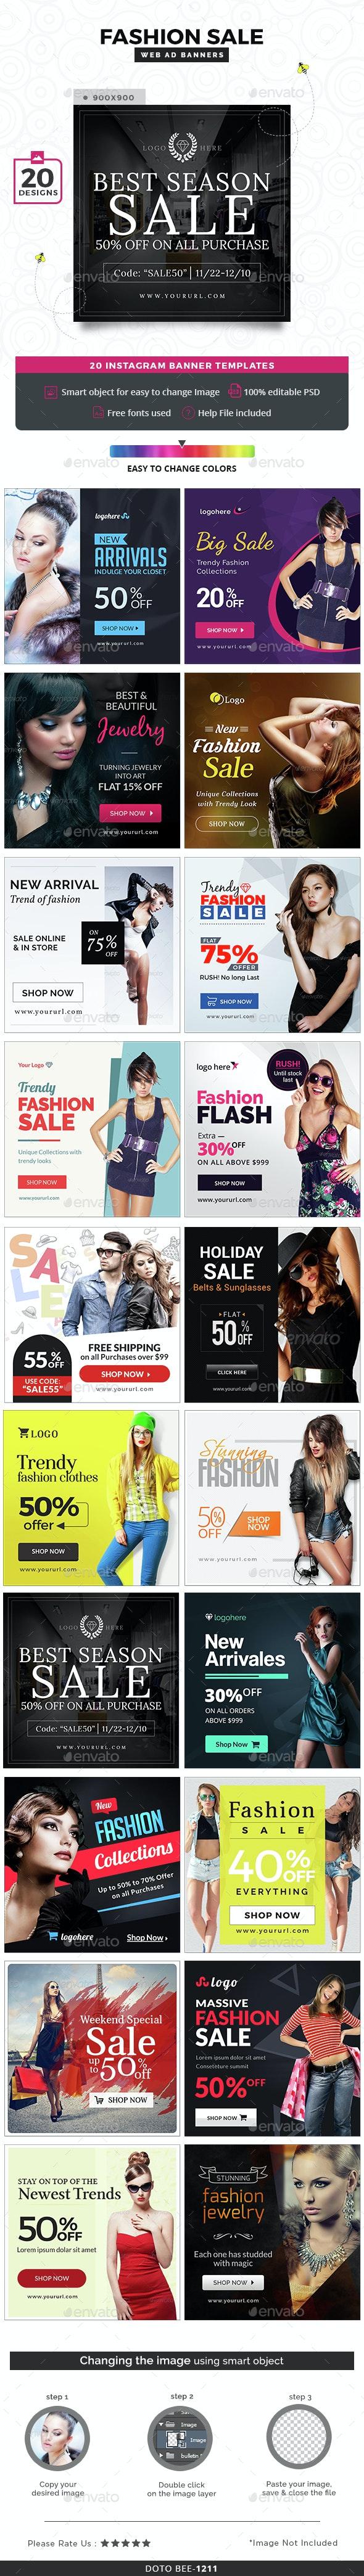 Fashion Sale Instagram Templates - 20 Designs - Social Media Web Elements